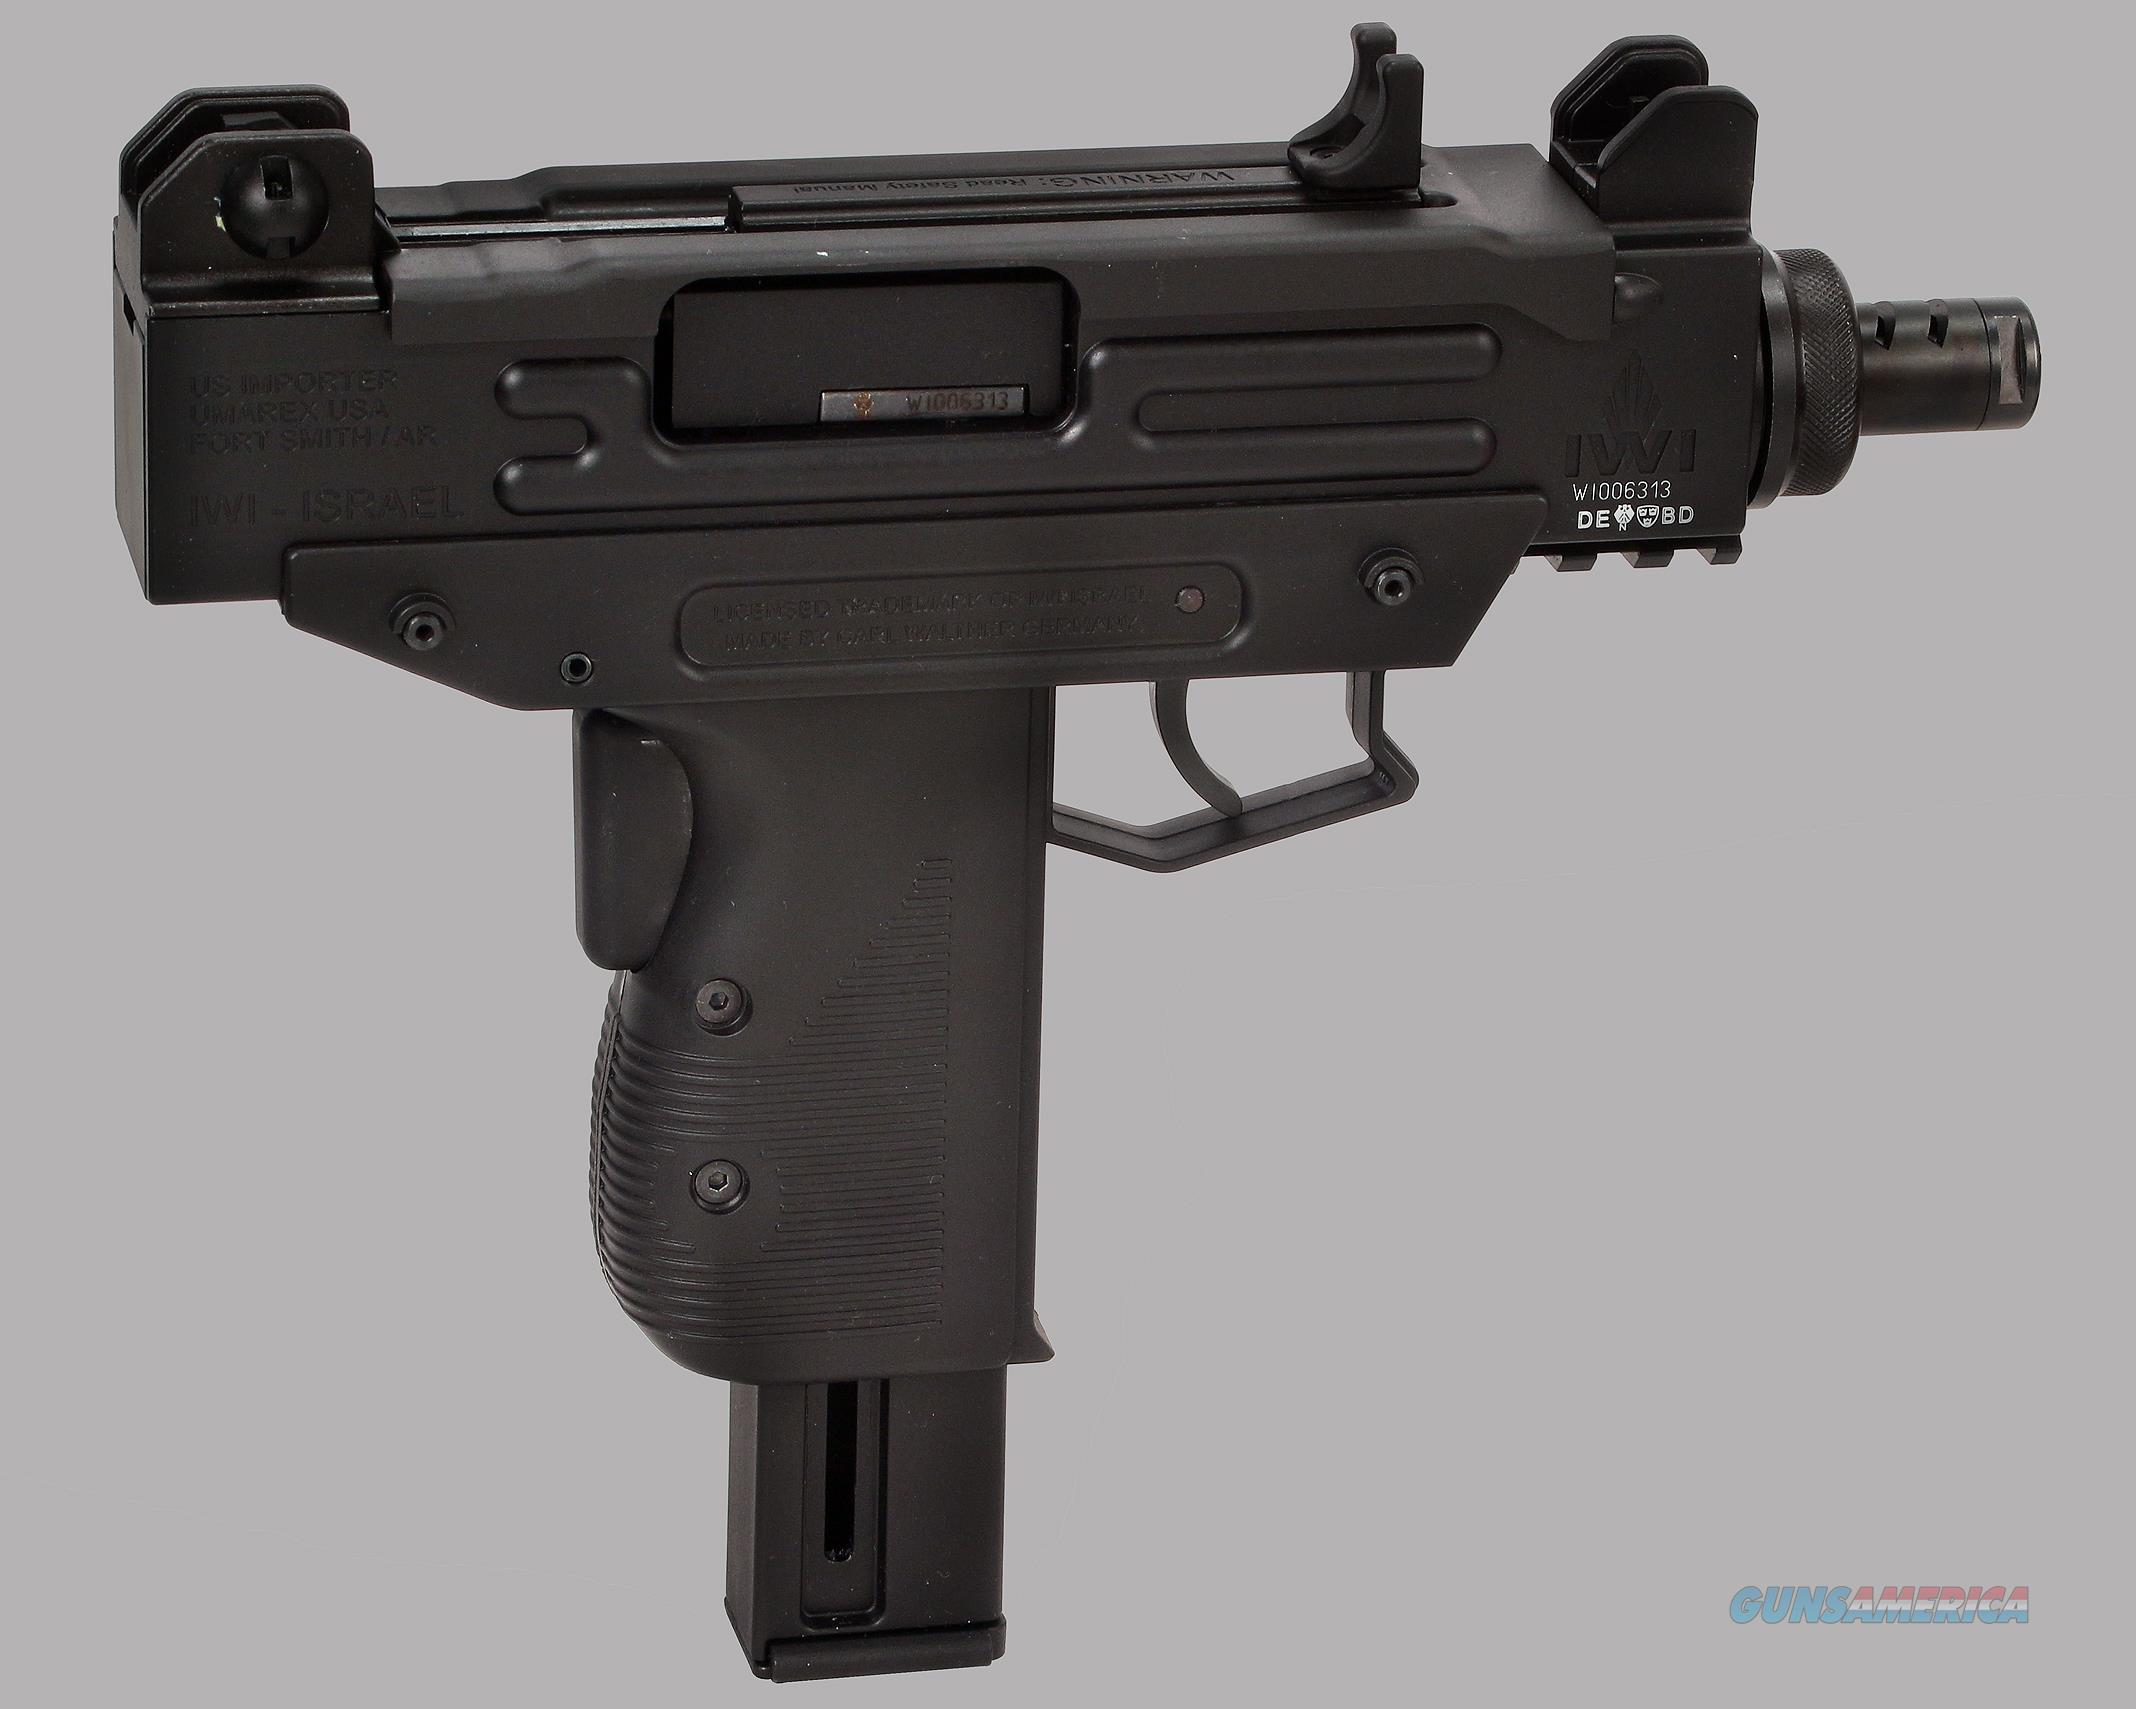 machine gun pistols for sale